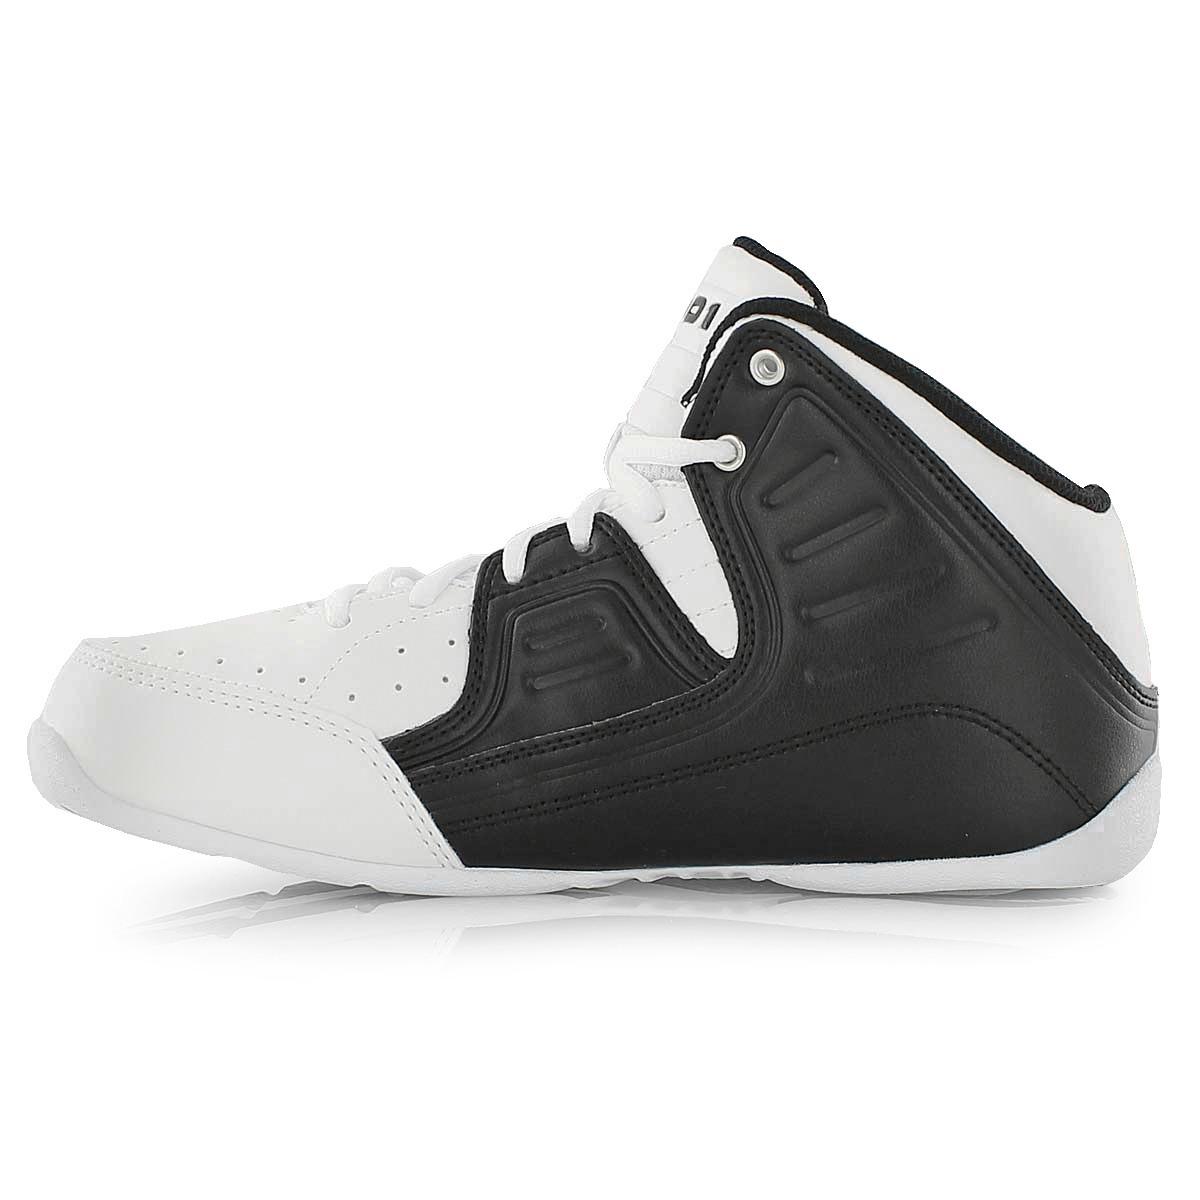 8829d827a37 zapatillas botas and1 basket modelo rocket 4 basquet niños. Cargando zoom.